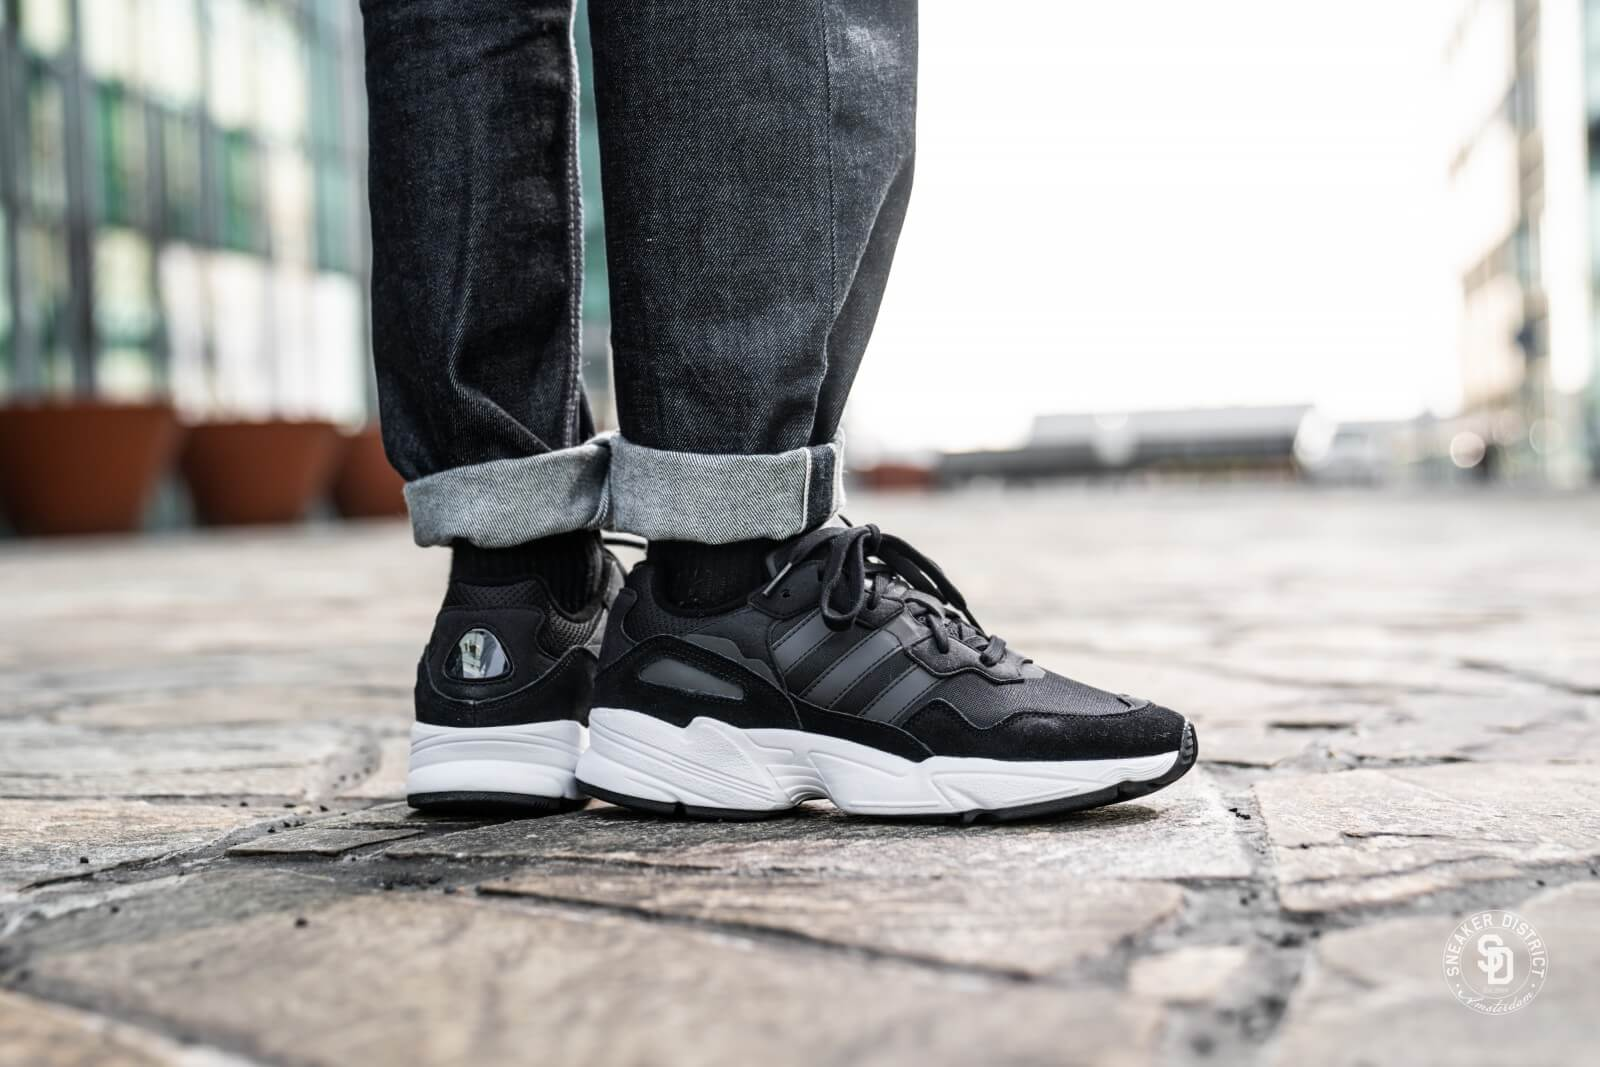 Adidas Yung-96 Core Black/Crystal White